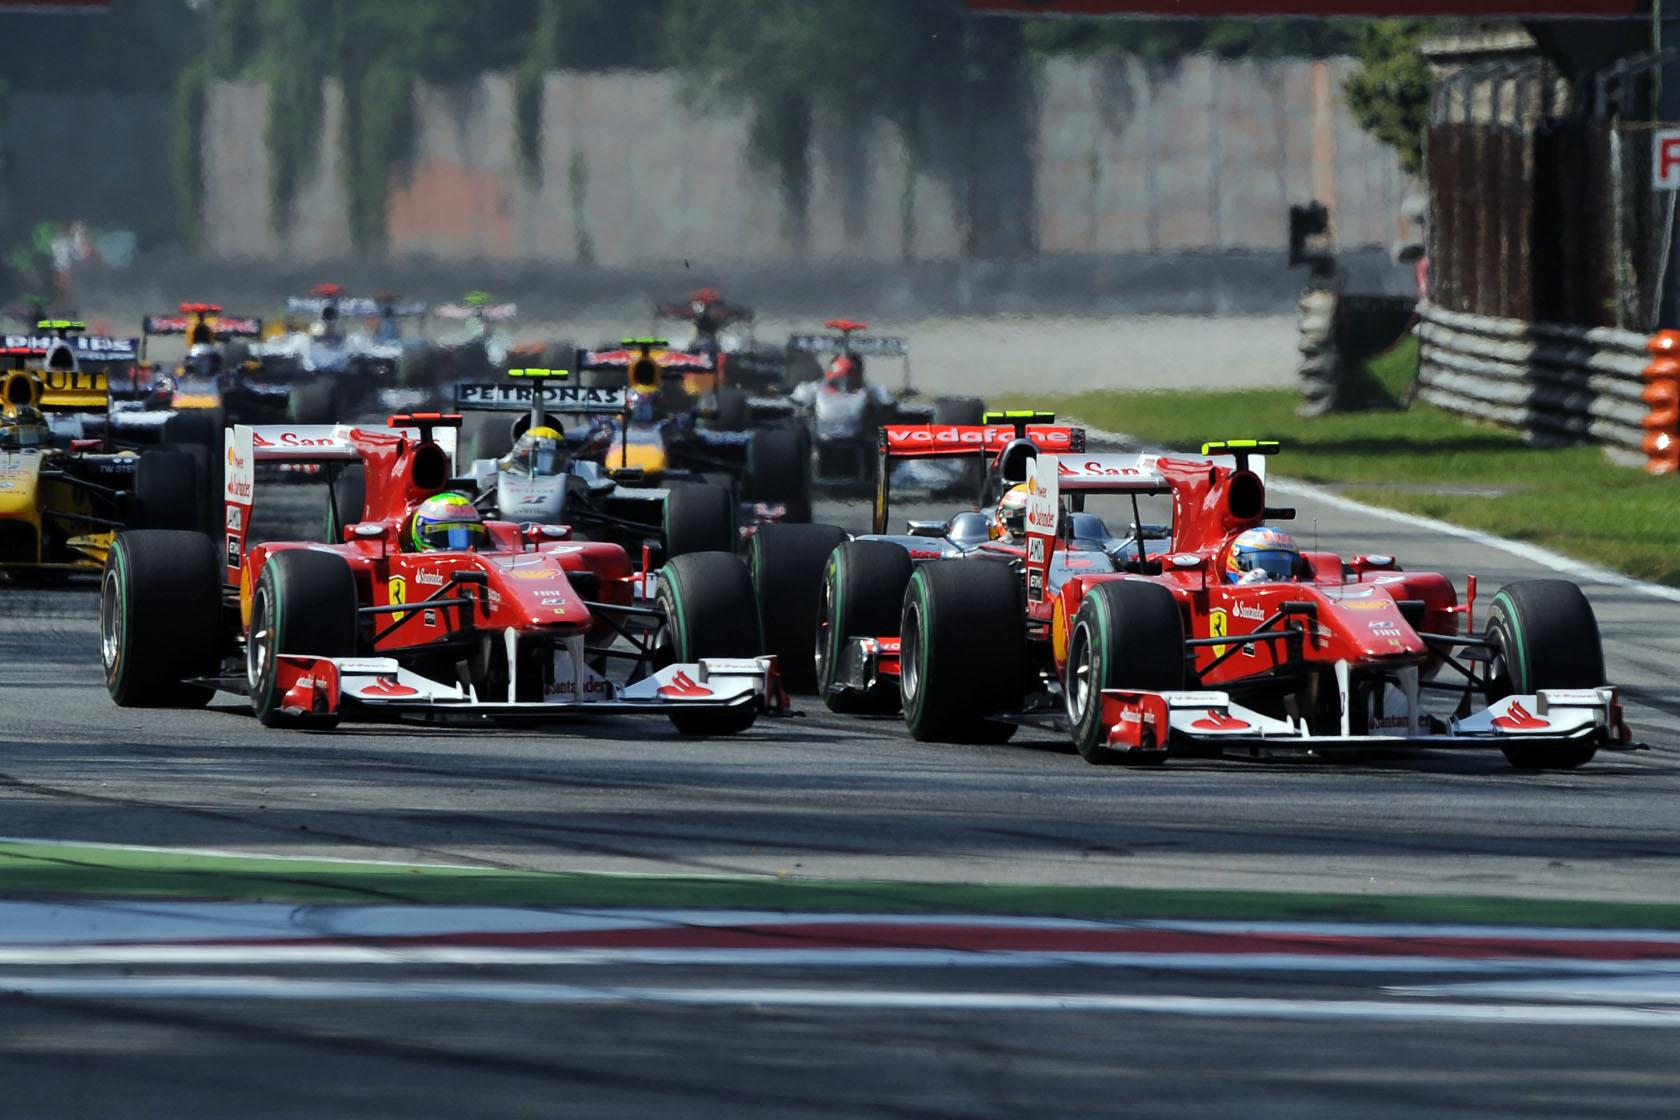 F1 Italian GP: Forza Ferrari | The Lowdown